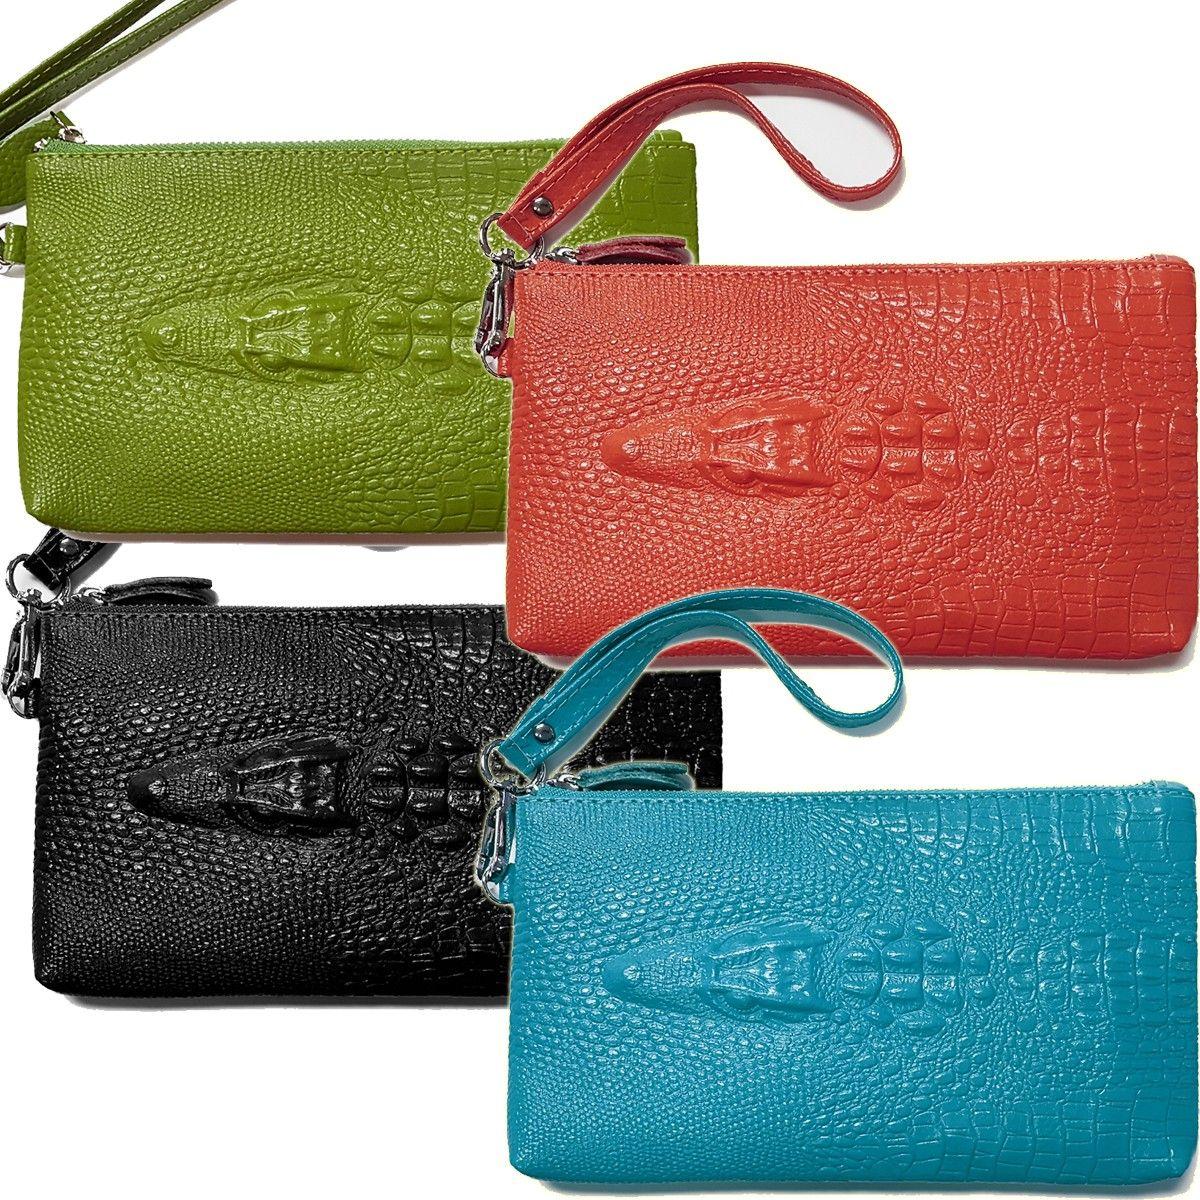 Alligator Handbags Louisiana Handbags 2018